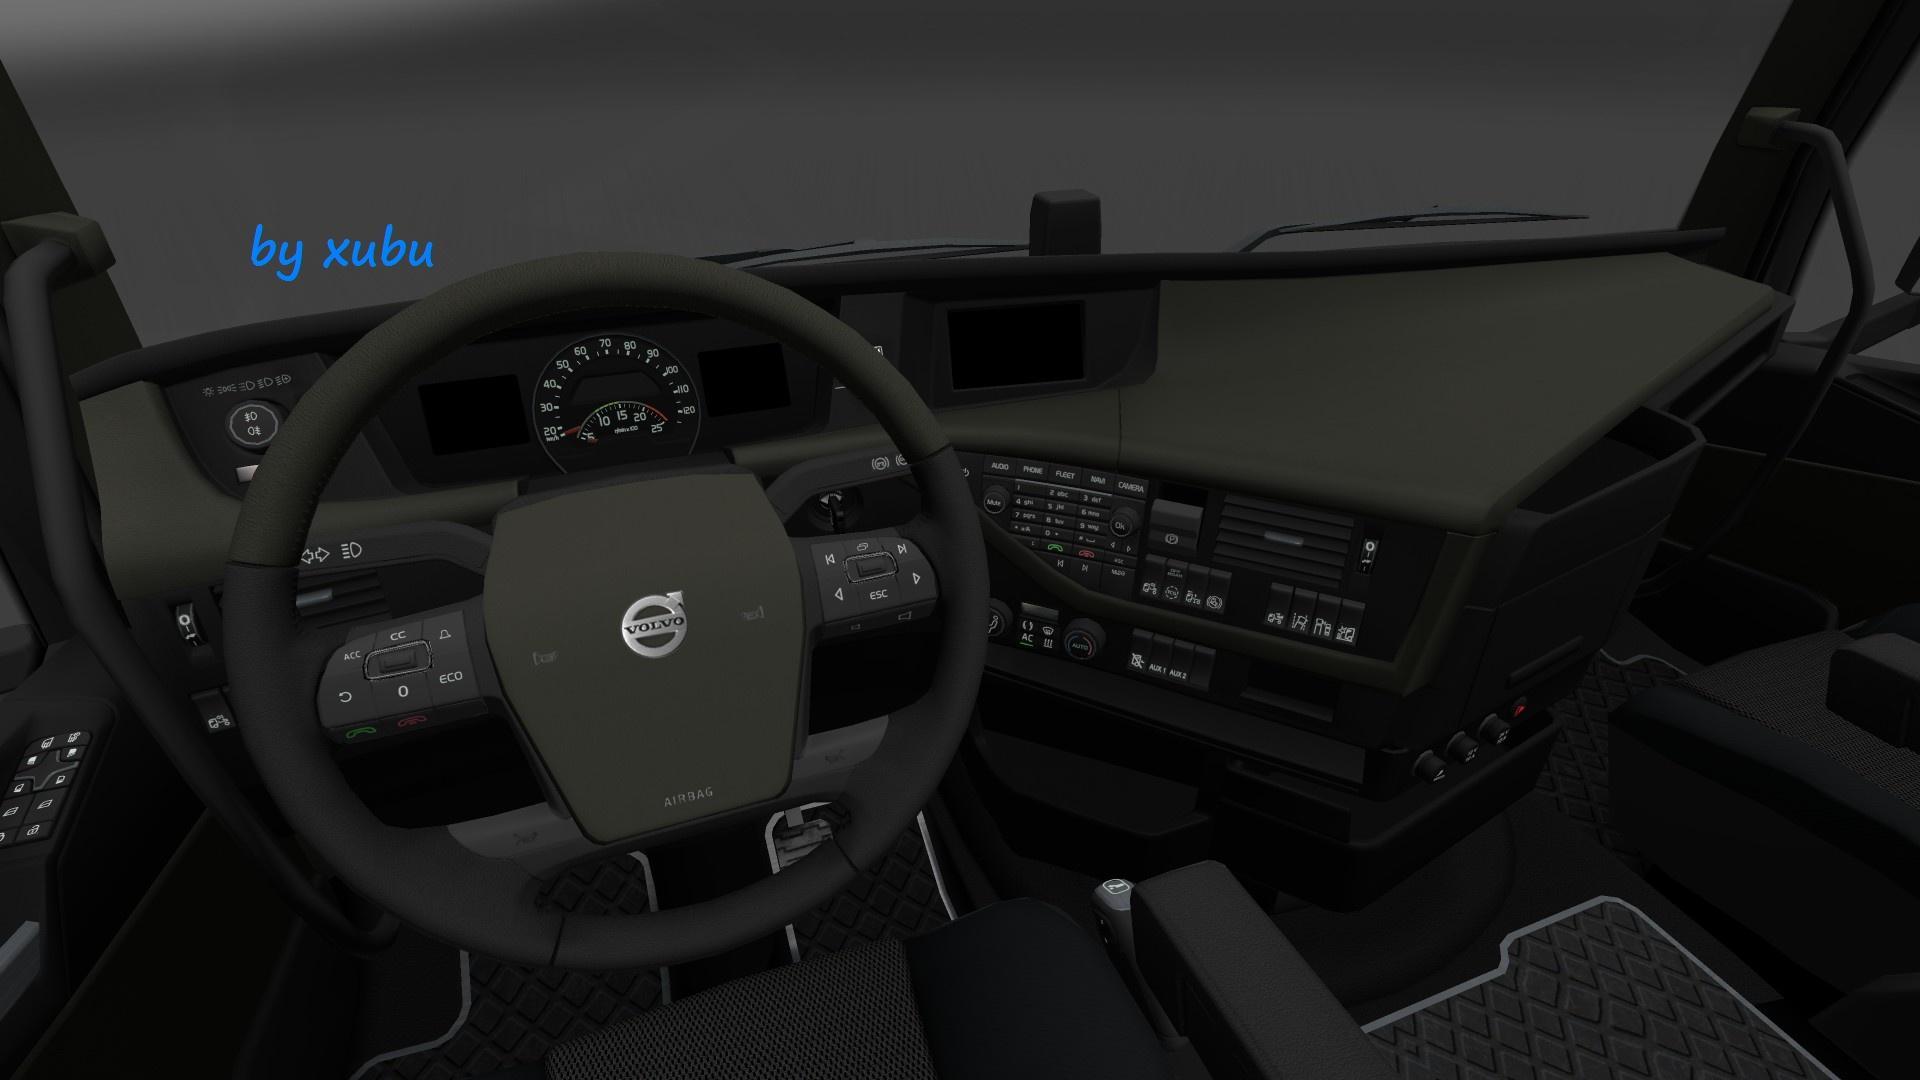 VOLVO FH 16 2012 OLIVE V1.0 Interior -Euro Truck Simulator 2 Mods